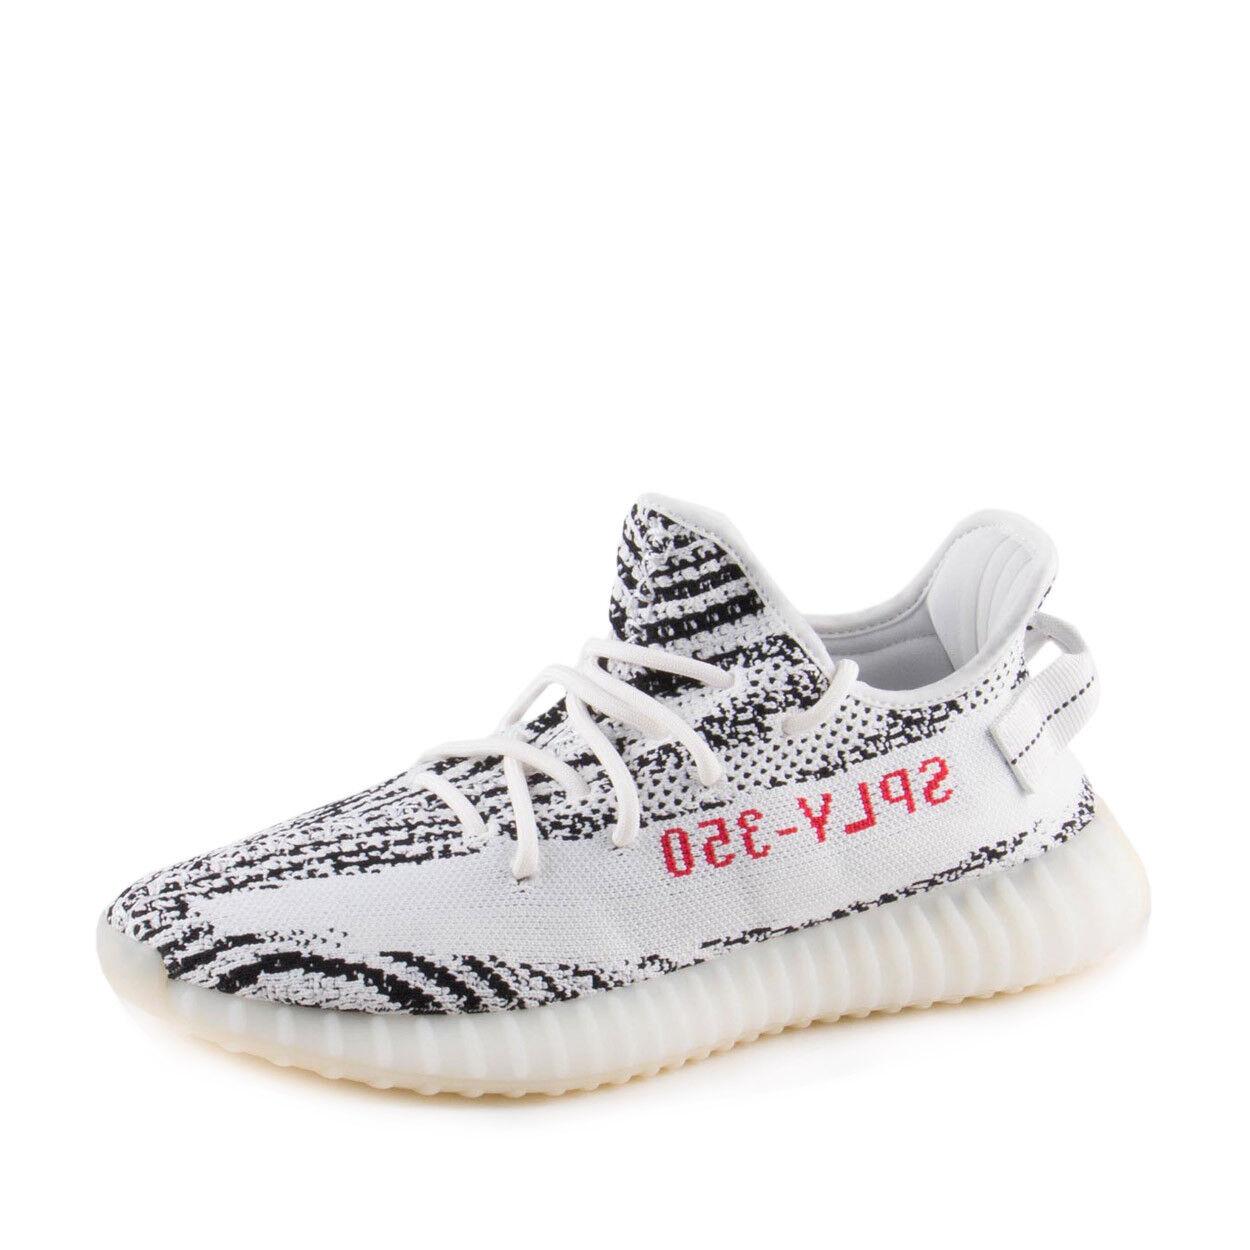 adidas Cp9654 Yeezy Boost 350 V2 Zebra in Hand 9